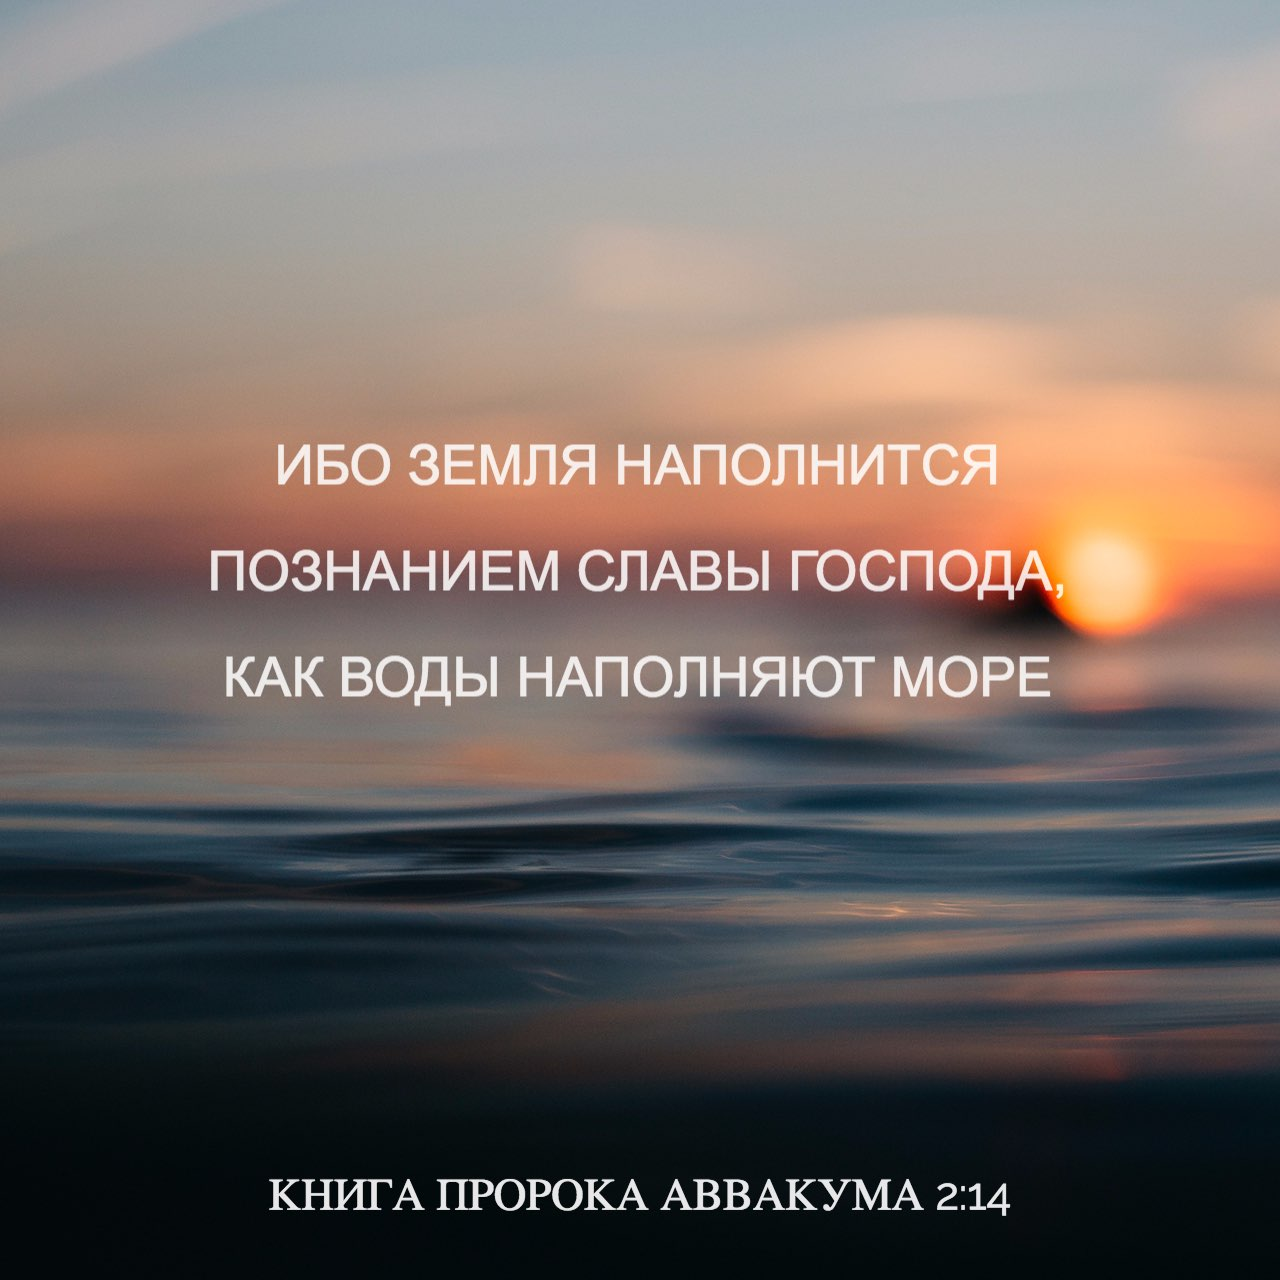 Фото-стих Аввакум 2:14.